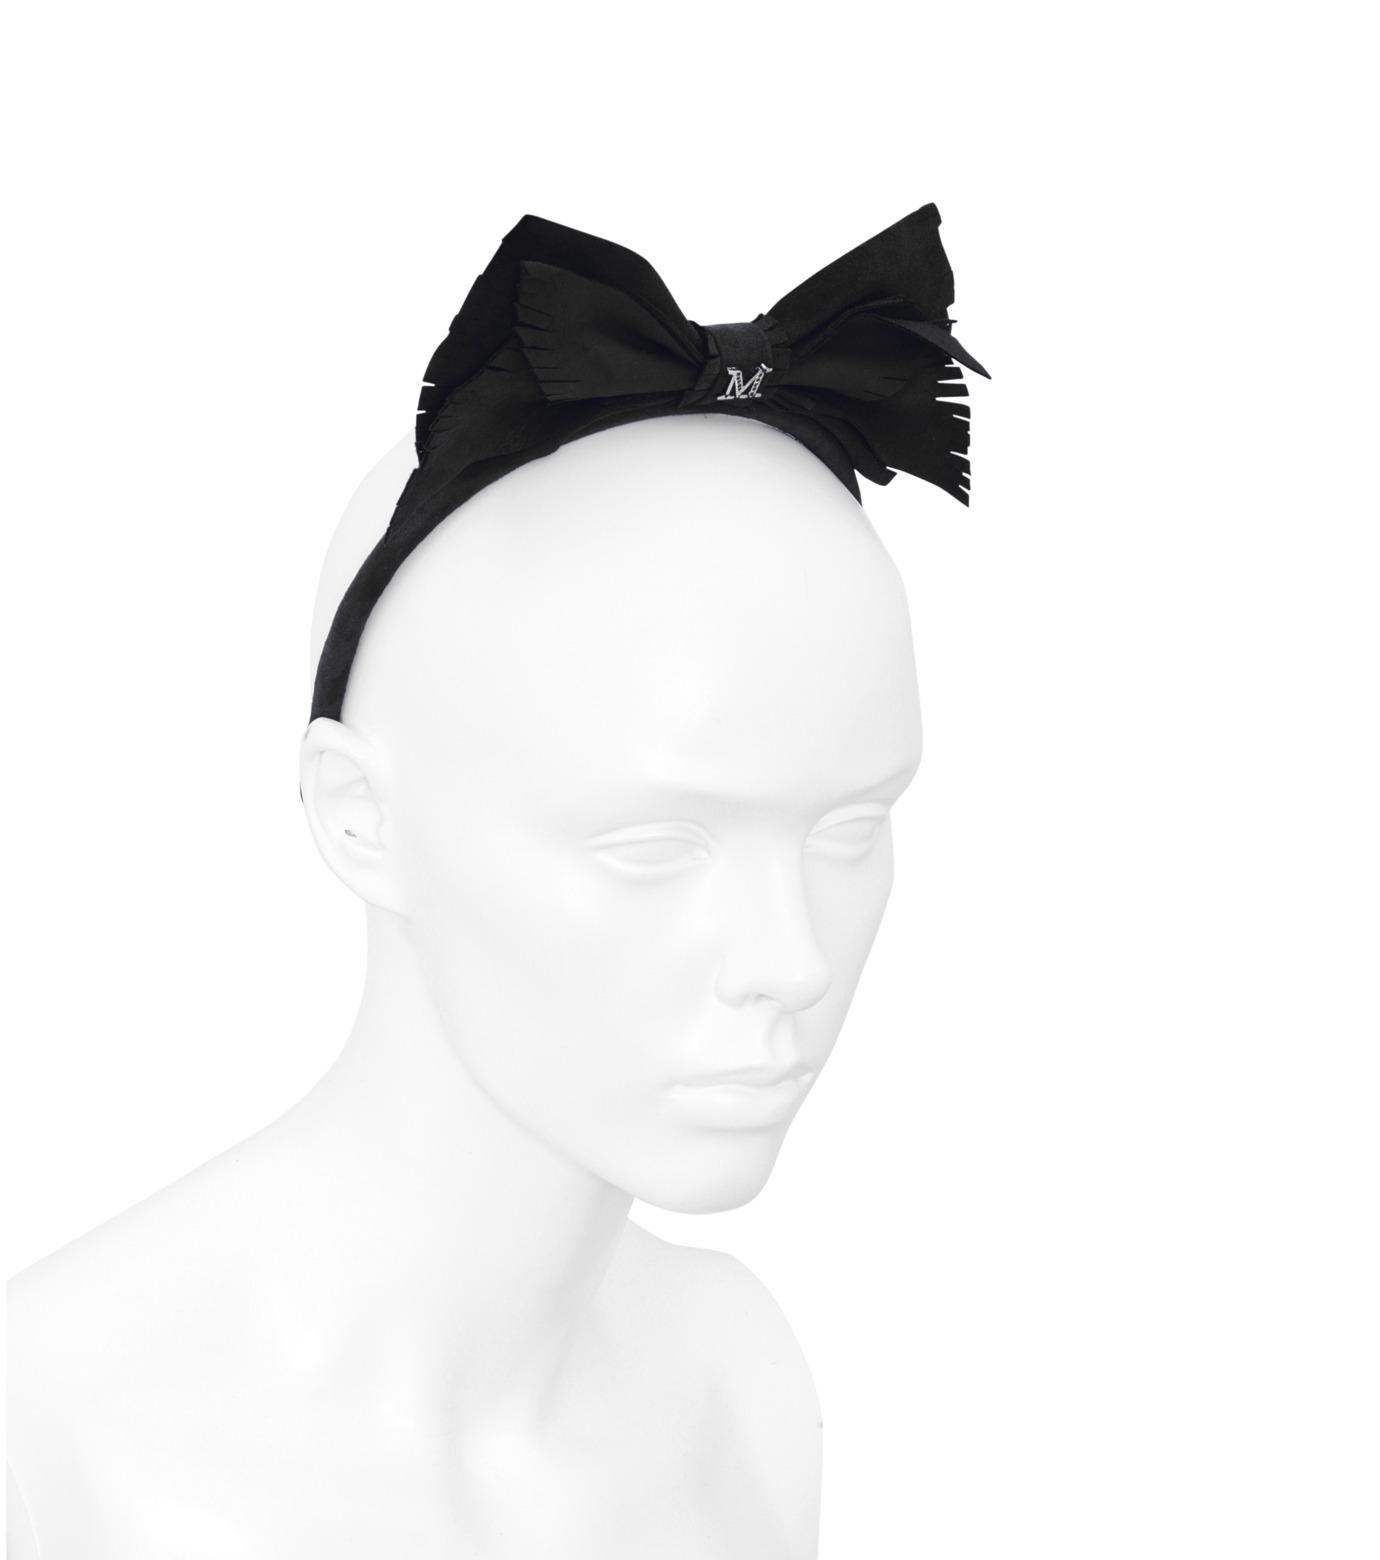 Maison Michel(メゾン ミシェル)のMartine Suede Bow-BLACK(HAIR ACCESSORIES/HAIR ACCESSORIES)-S14096-13 拡大詳細画像3